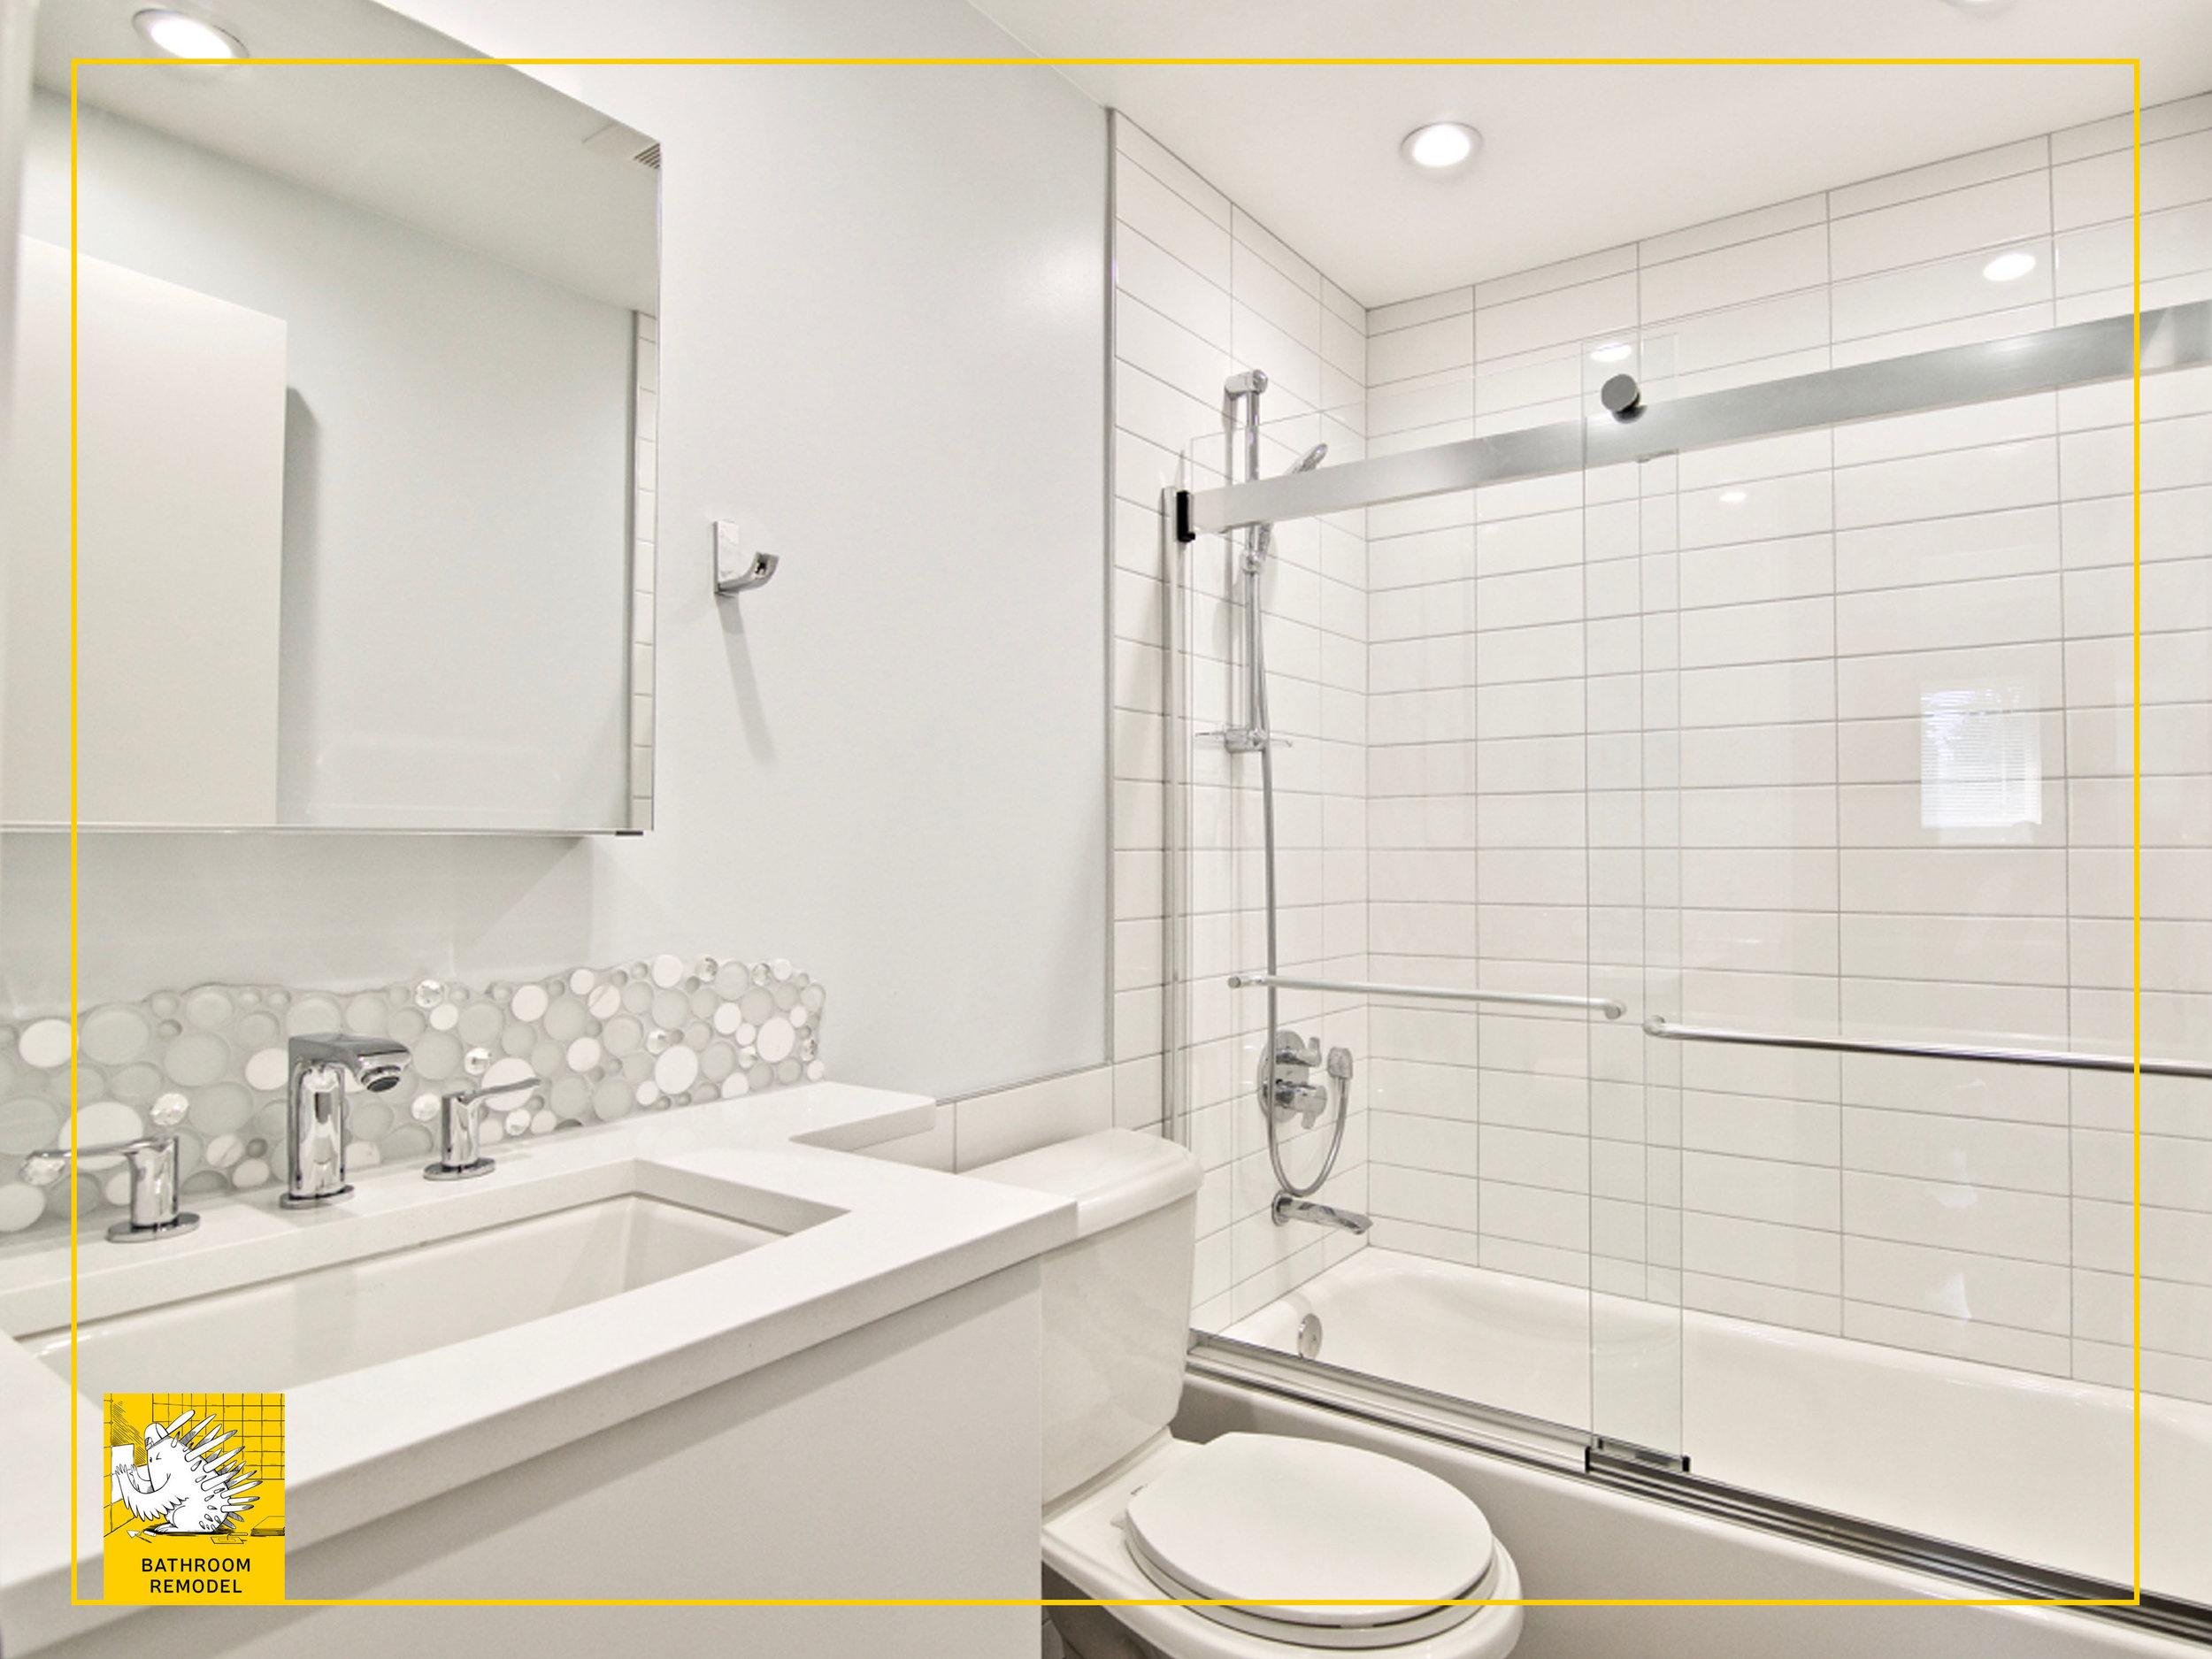 MT bathroom 4 after 4.jpg